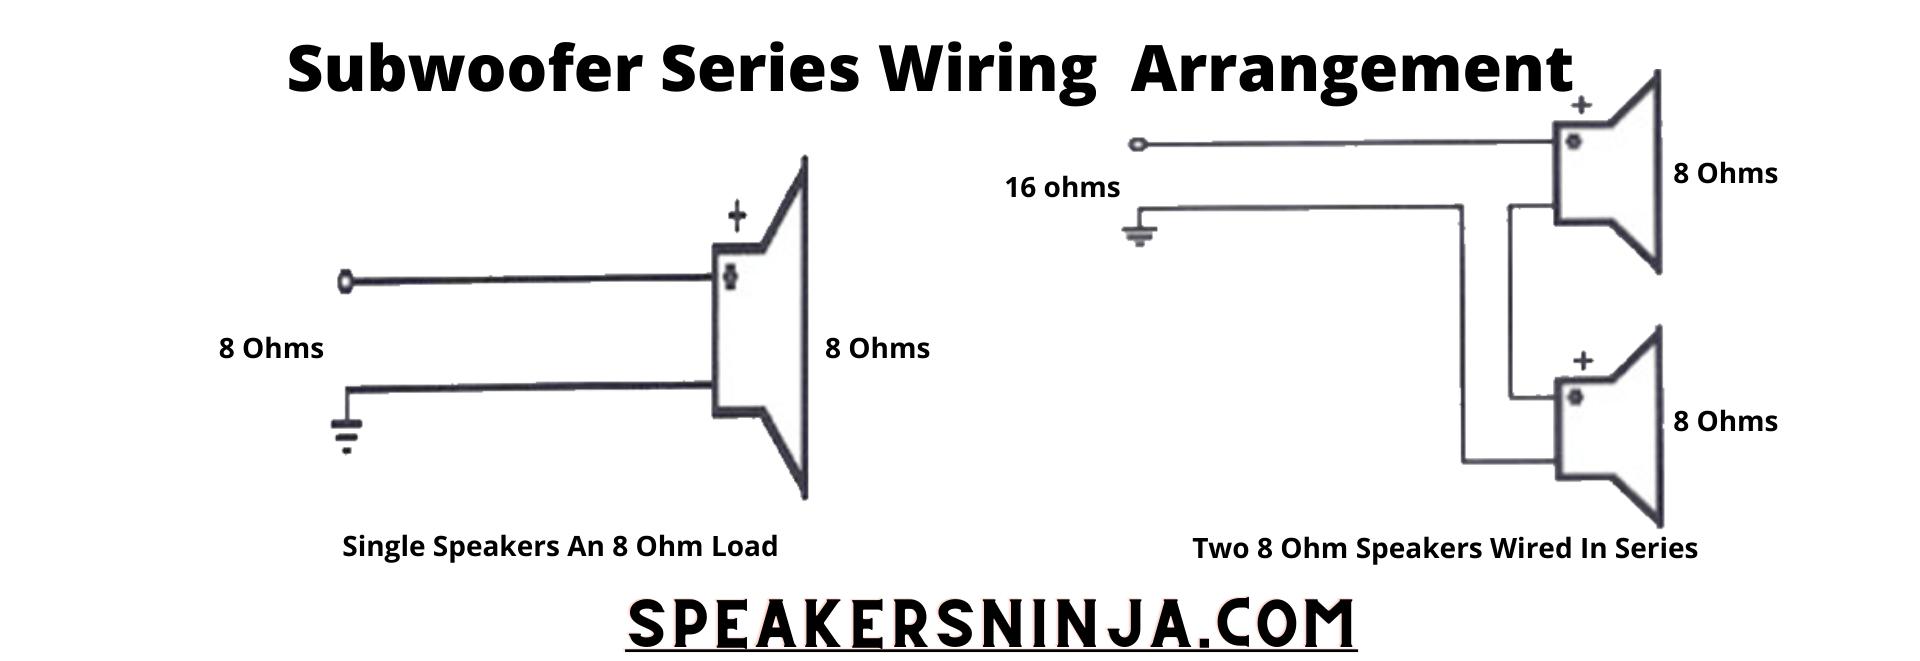 Subwoofer Series Wiring Arrangement